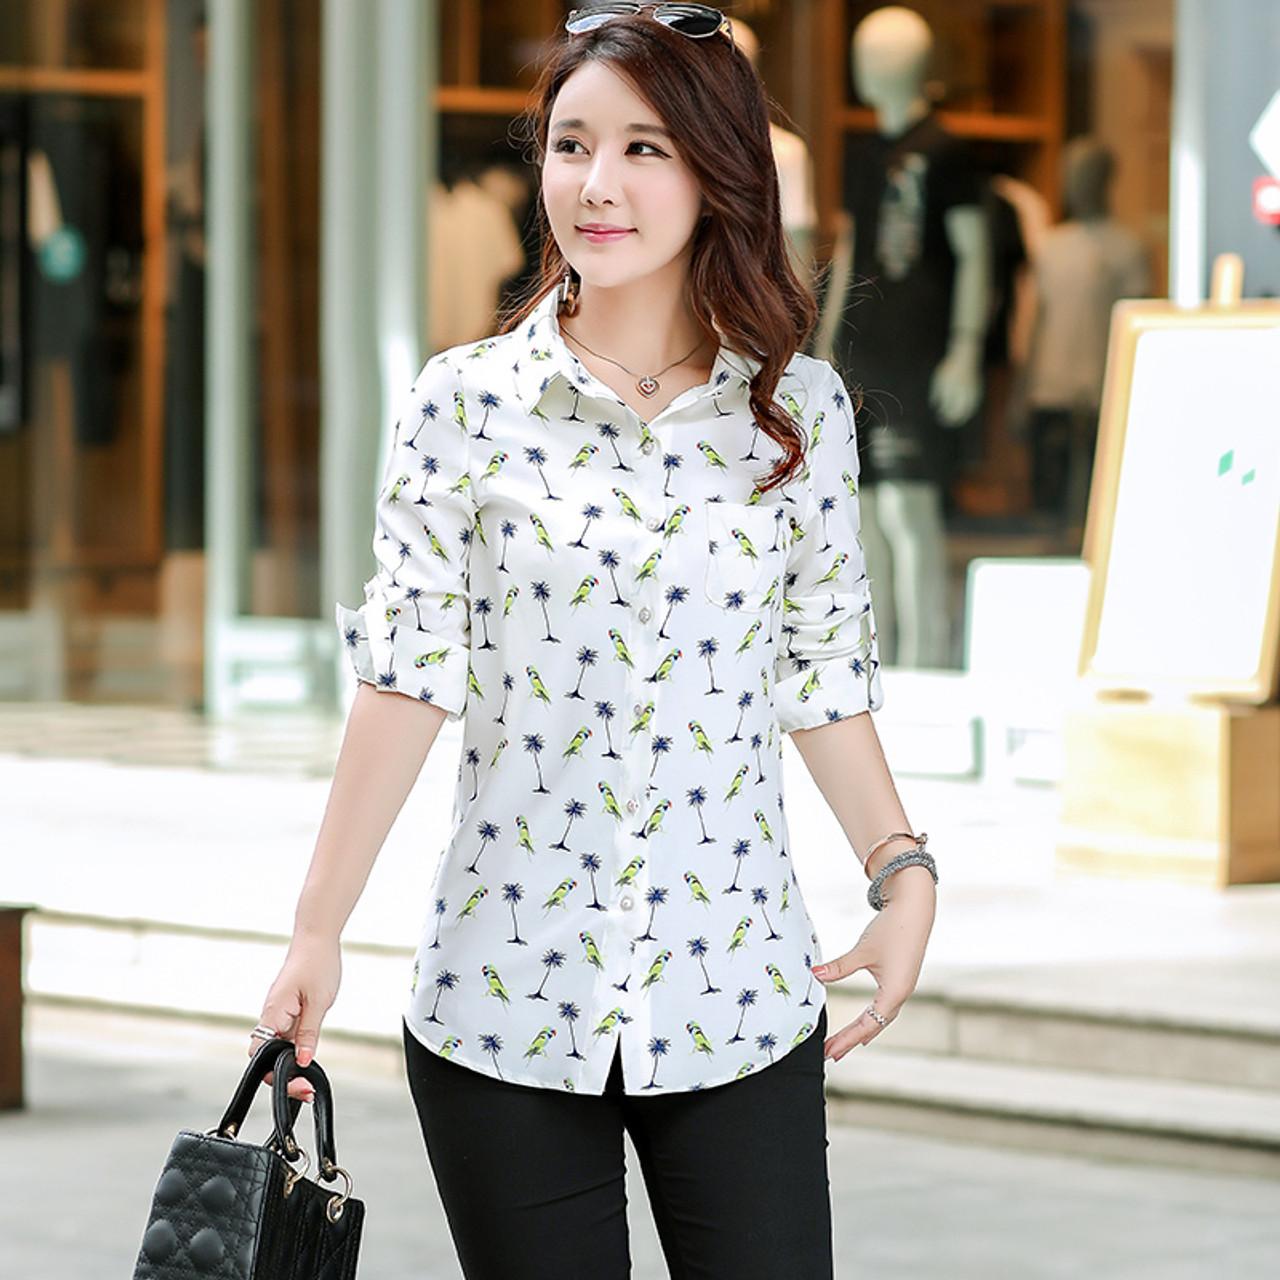 bc2960fde78 ... New Fashion Print Blouses Women Long Style Shirts 2018 Cotton Ladies Tops  Long Sleeve Blusas Femininas ...